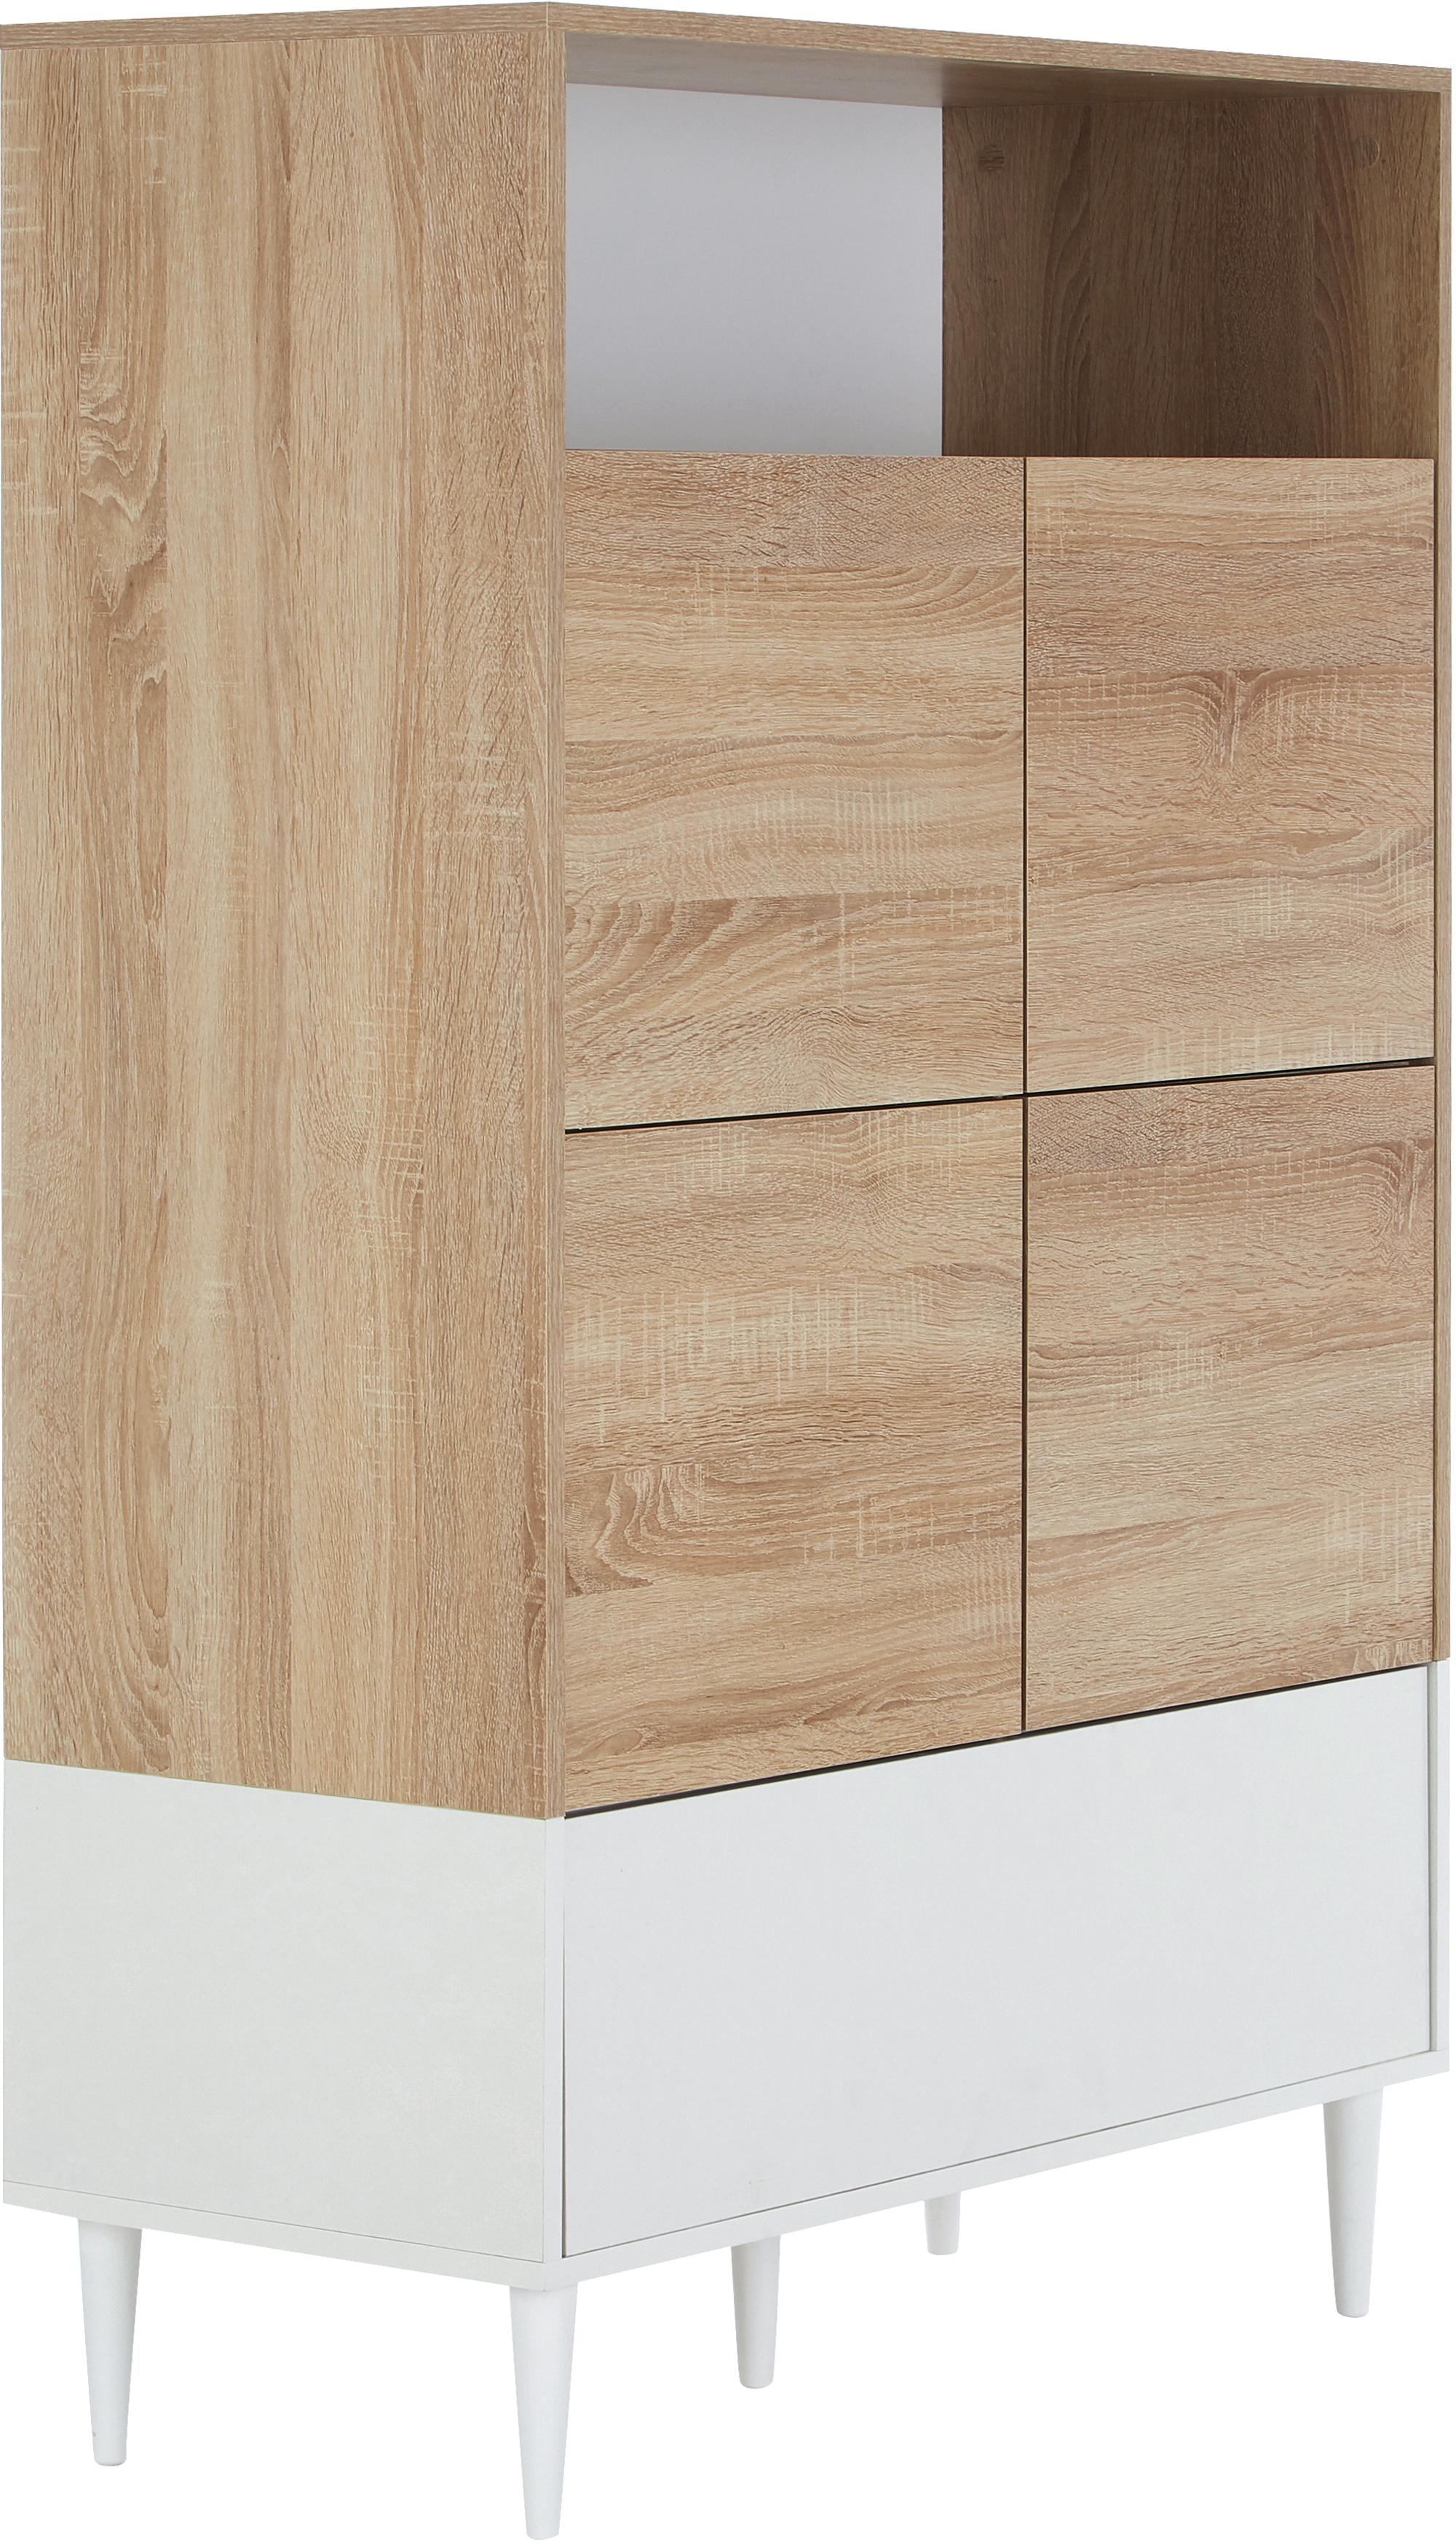 Hohes Highboard Horizon im Skandi Design, Korpus: Spanplatte, melaminbeschi, Füße: Buchenholz, massiv, lacki, Eichenholz, Weiß, 90 x 141 cm